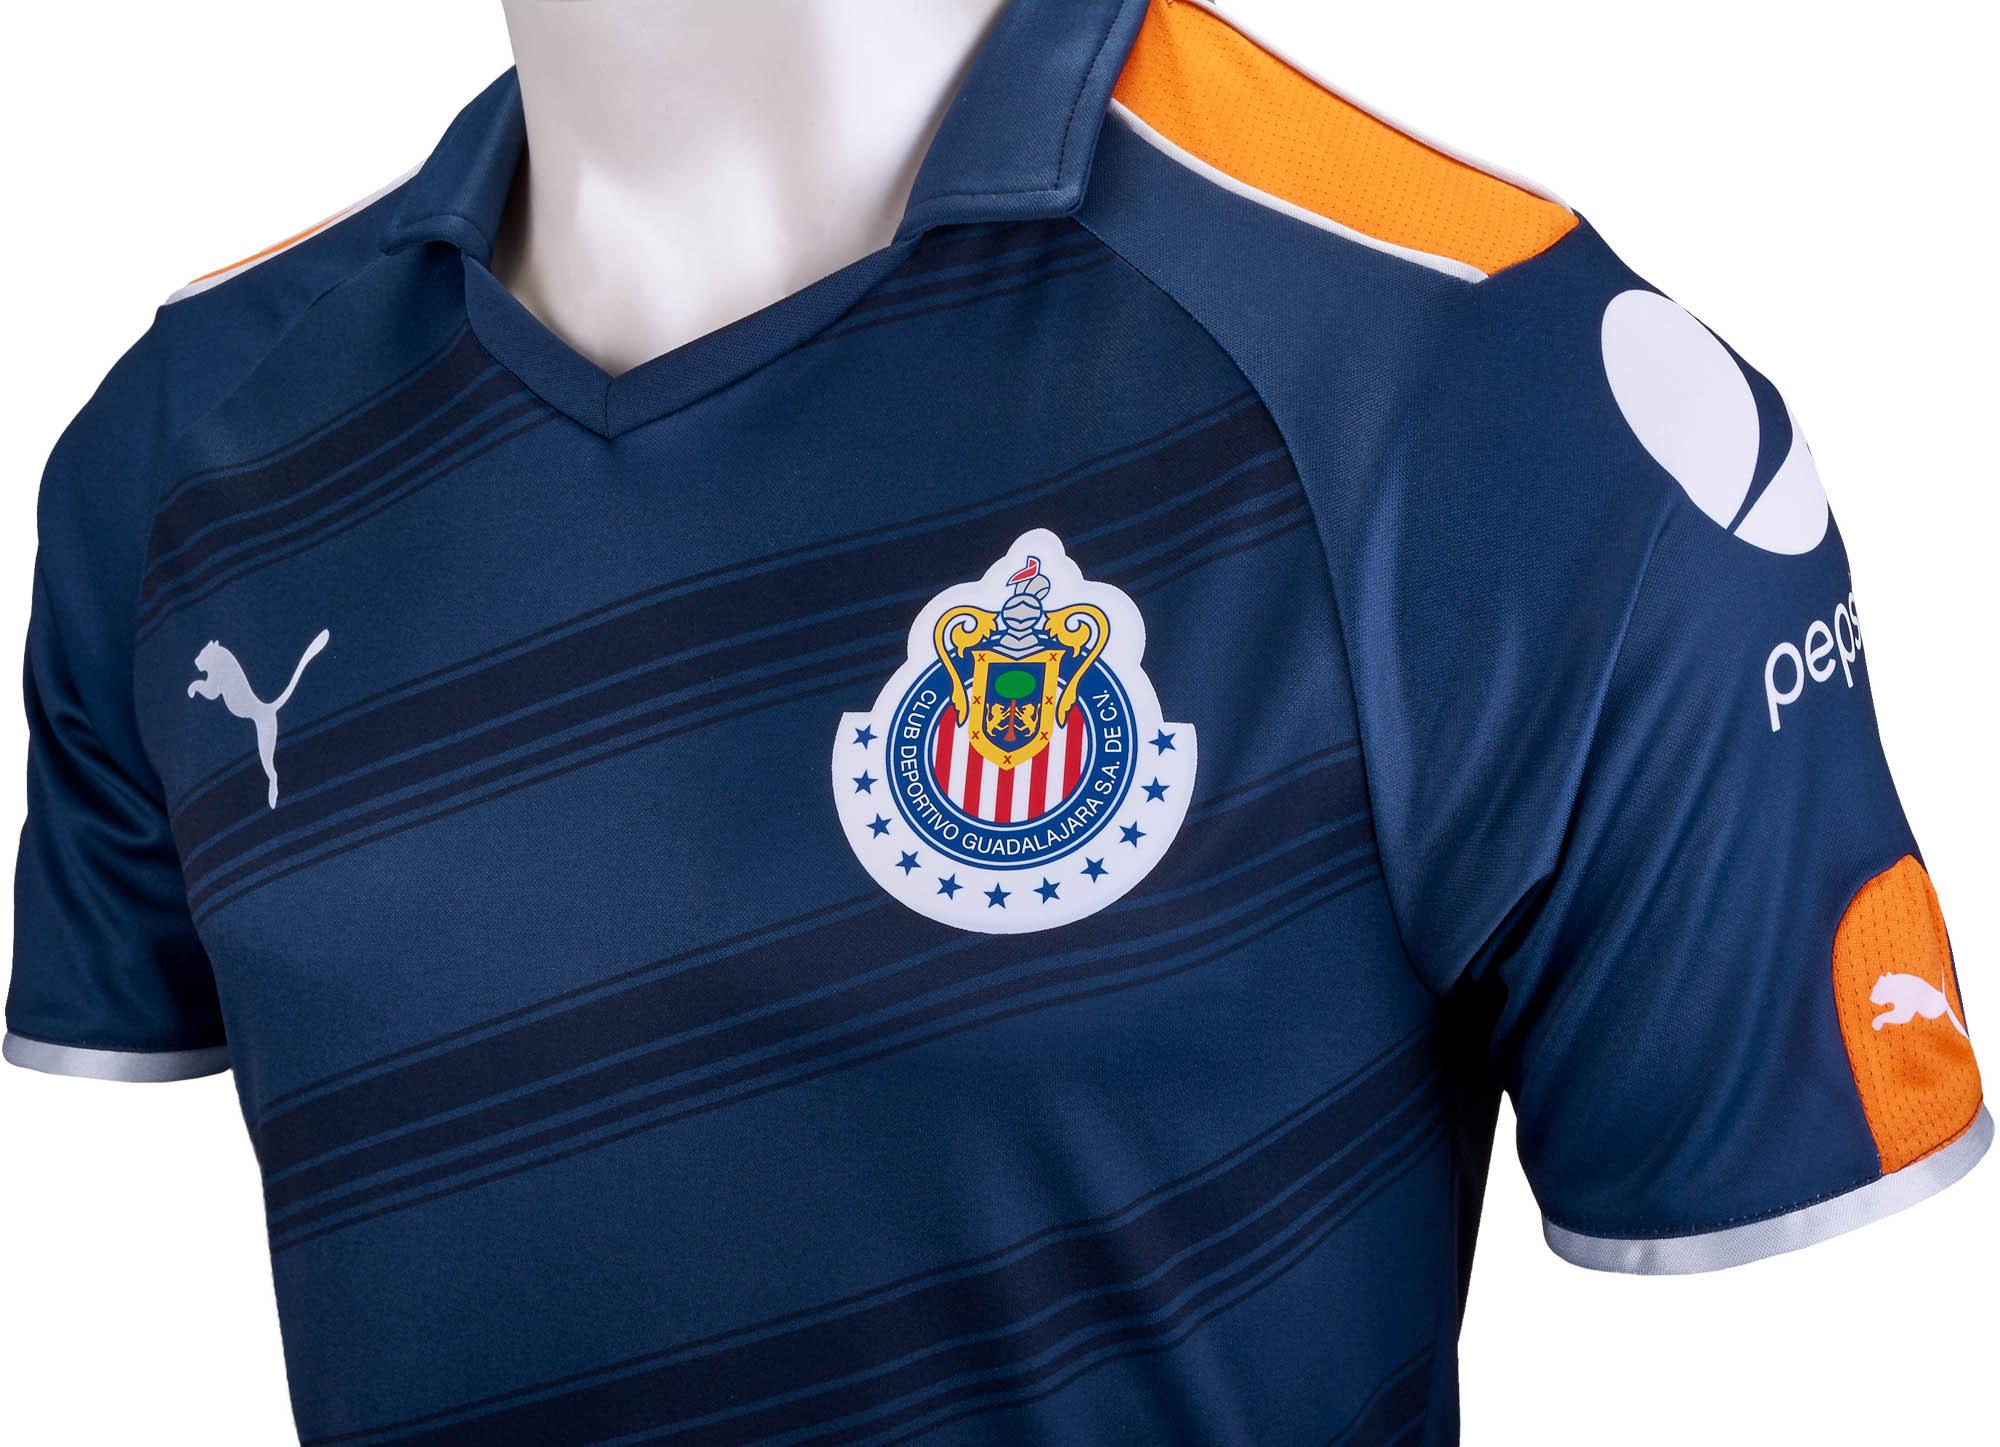 a83533617 Puma Chivas 3rd Jersey 2016-17